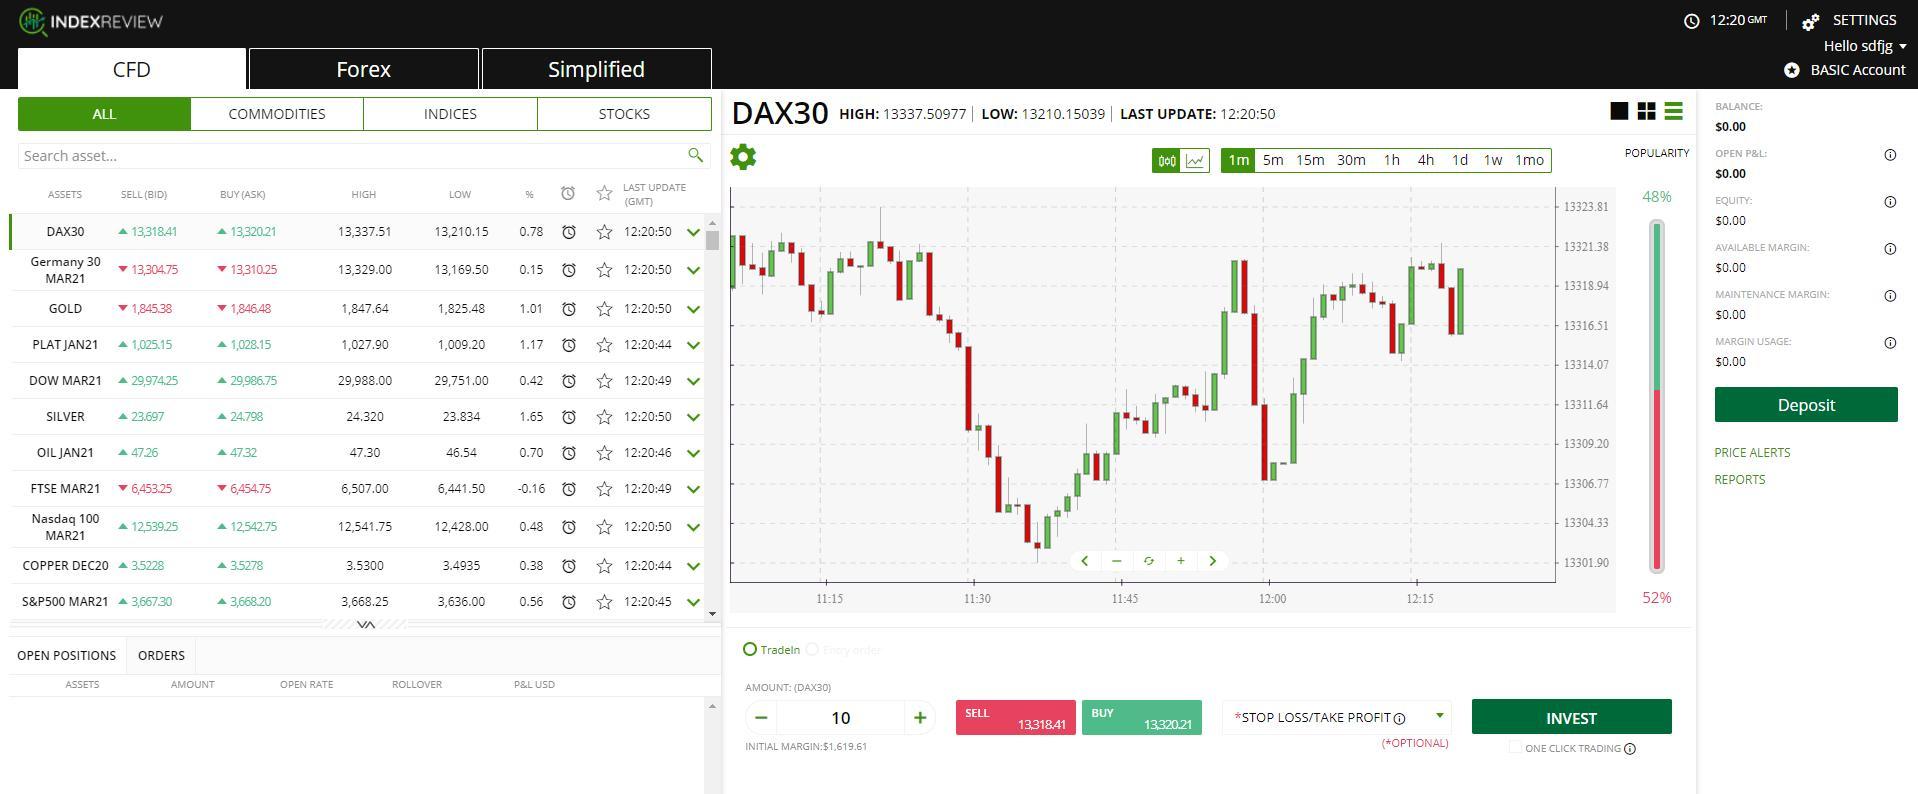 Index Review trading platform